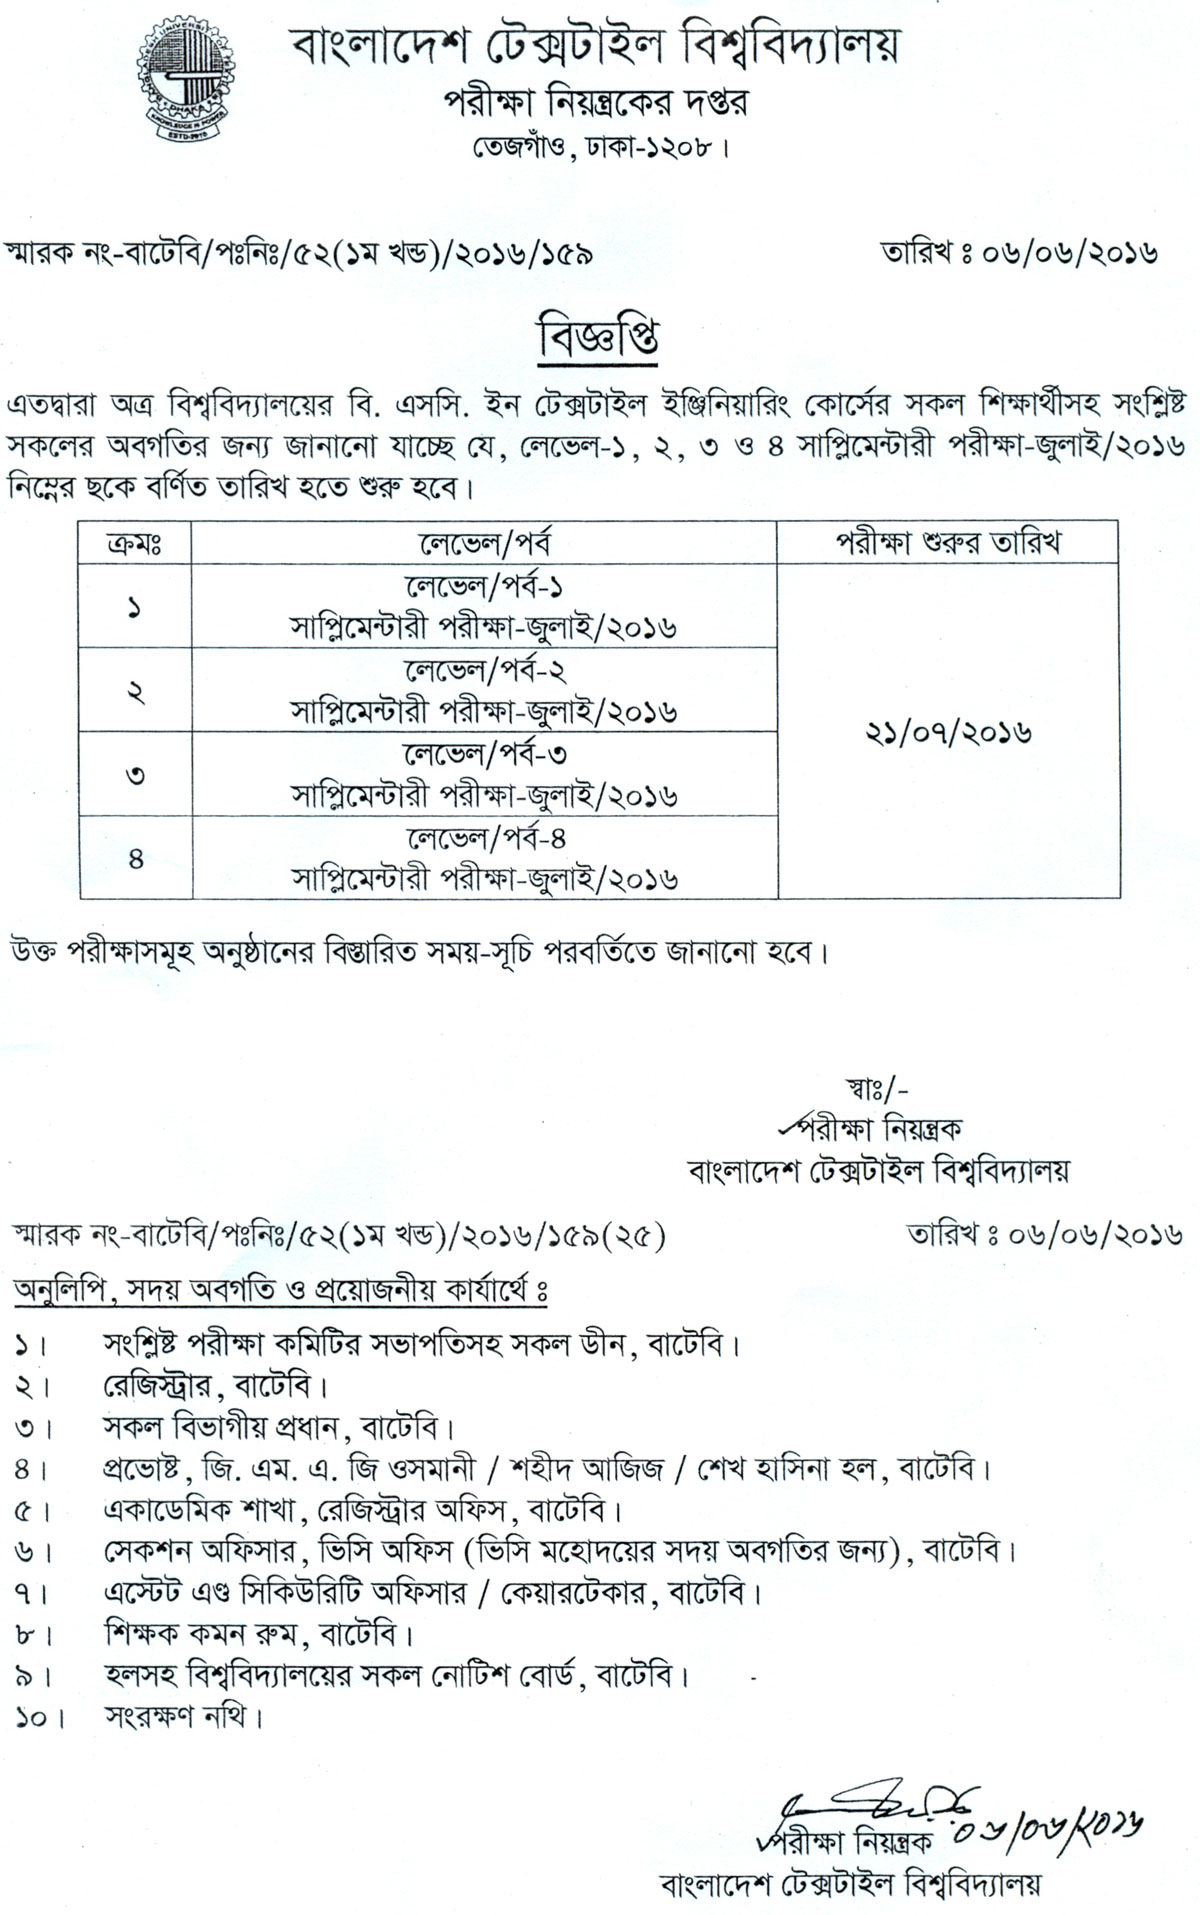 Suppl-Exam-Schedul